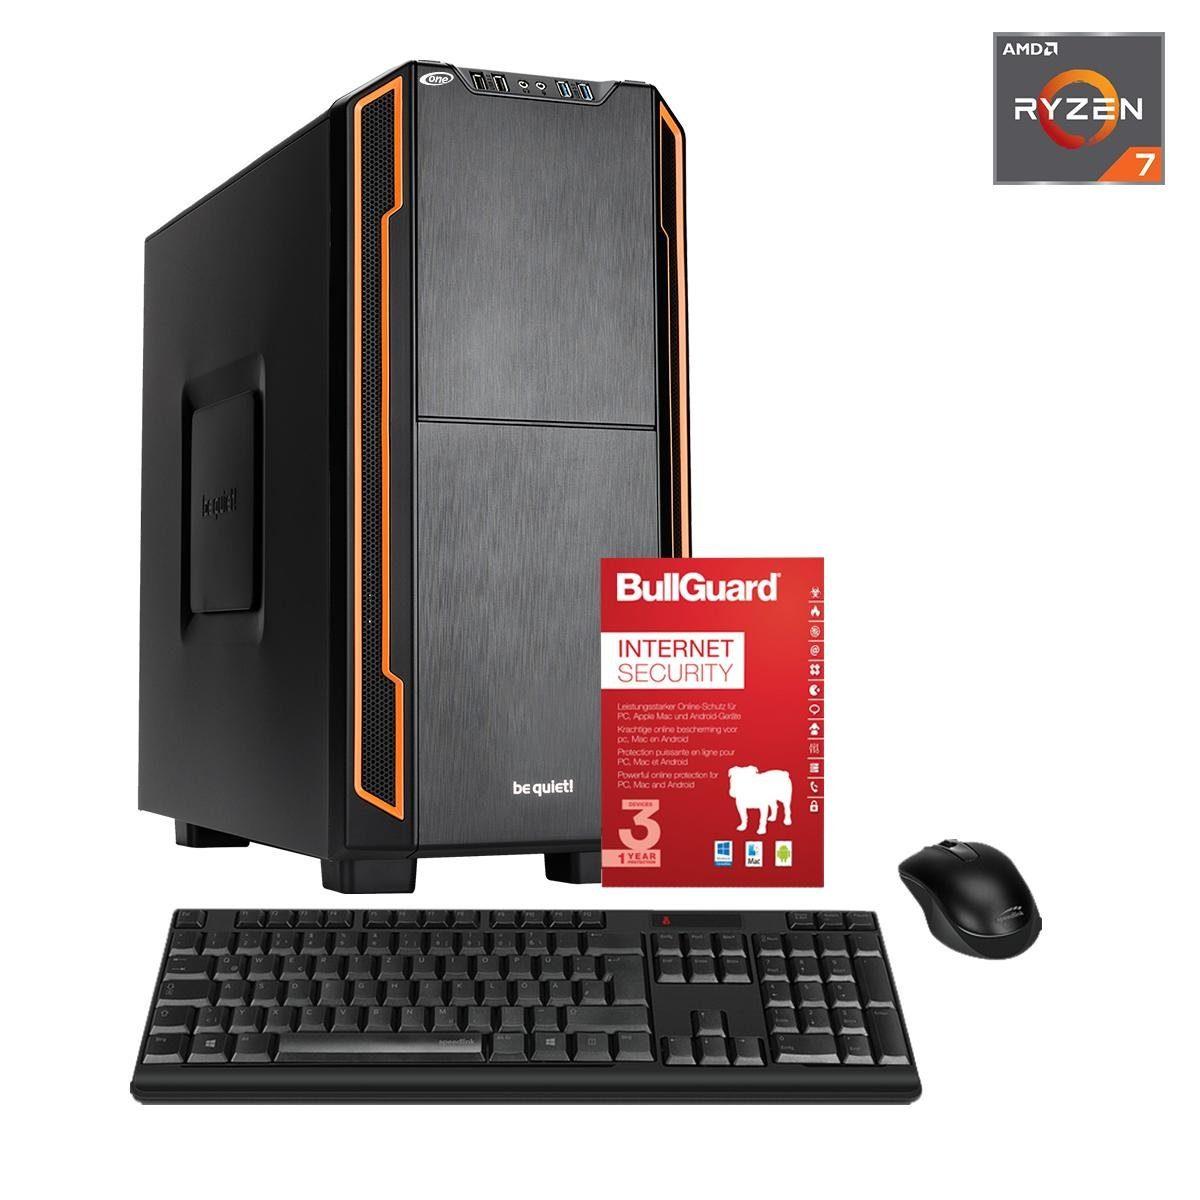 ONE PC, Ryzen 7 2700, GeForce GT 1030, 8GB DDR4 RAM »PC 44092«